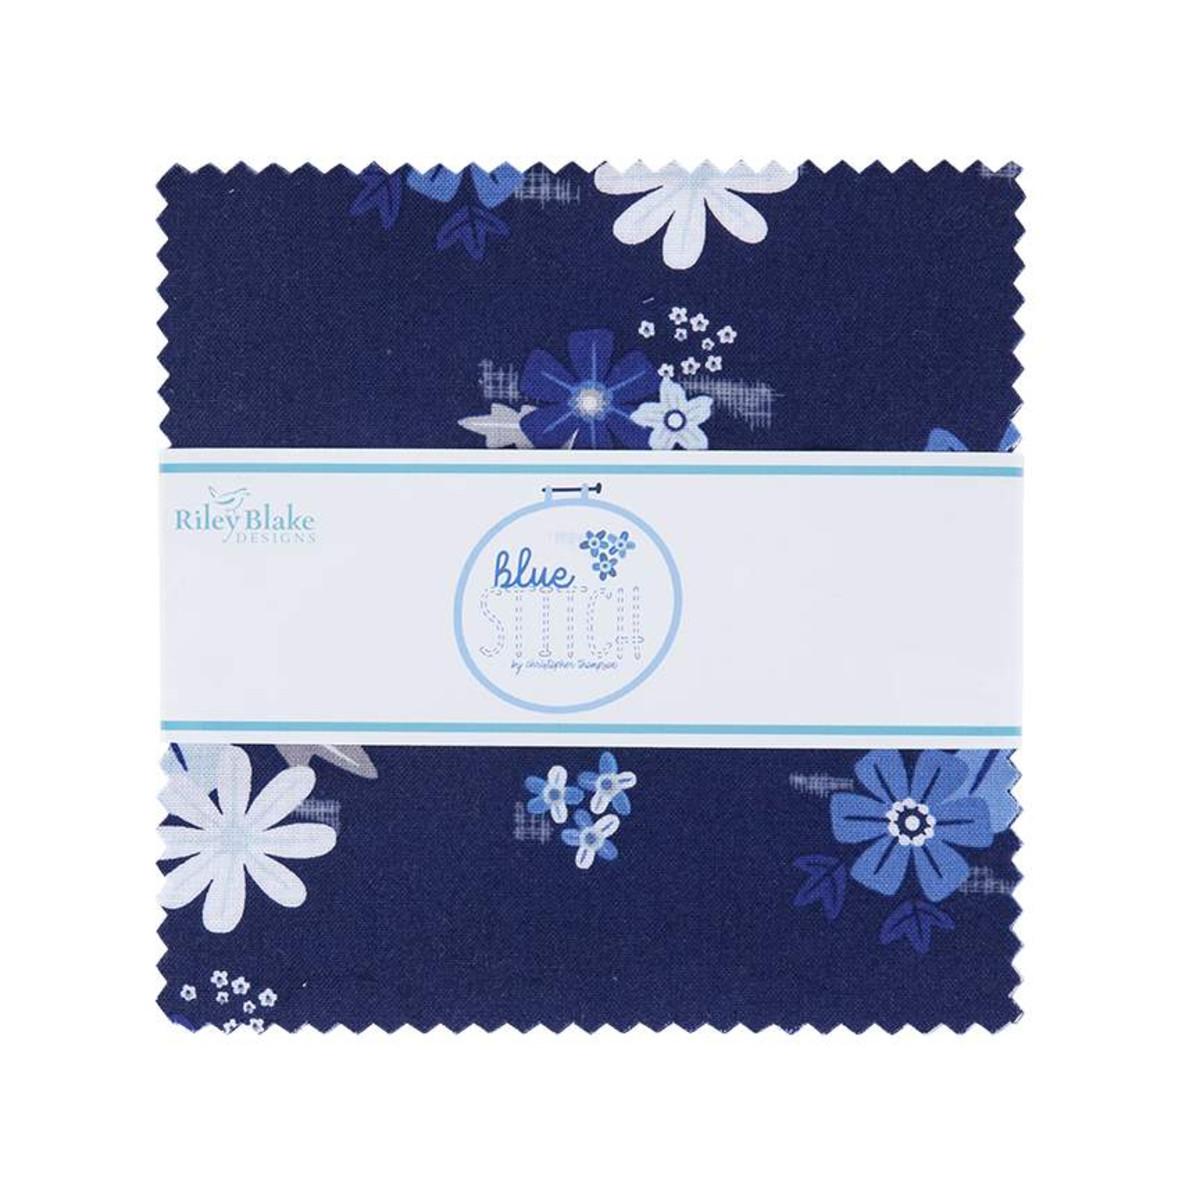 Riley Blake Charm Pack - Blue Stitch